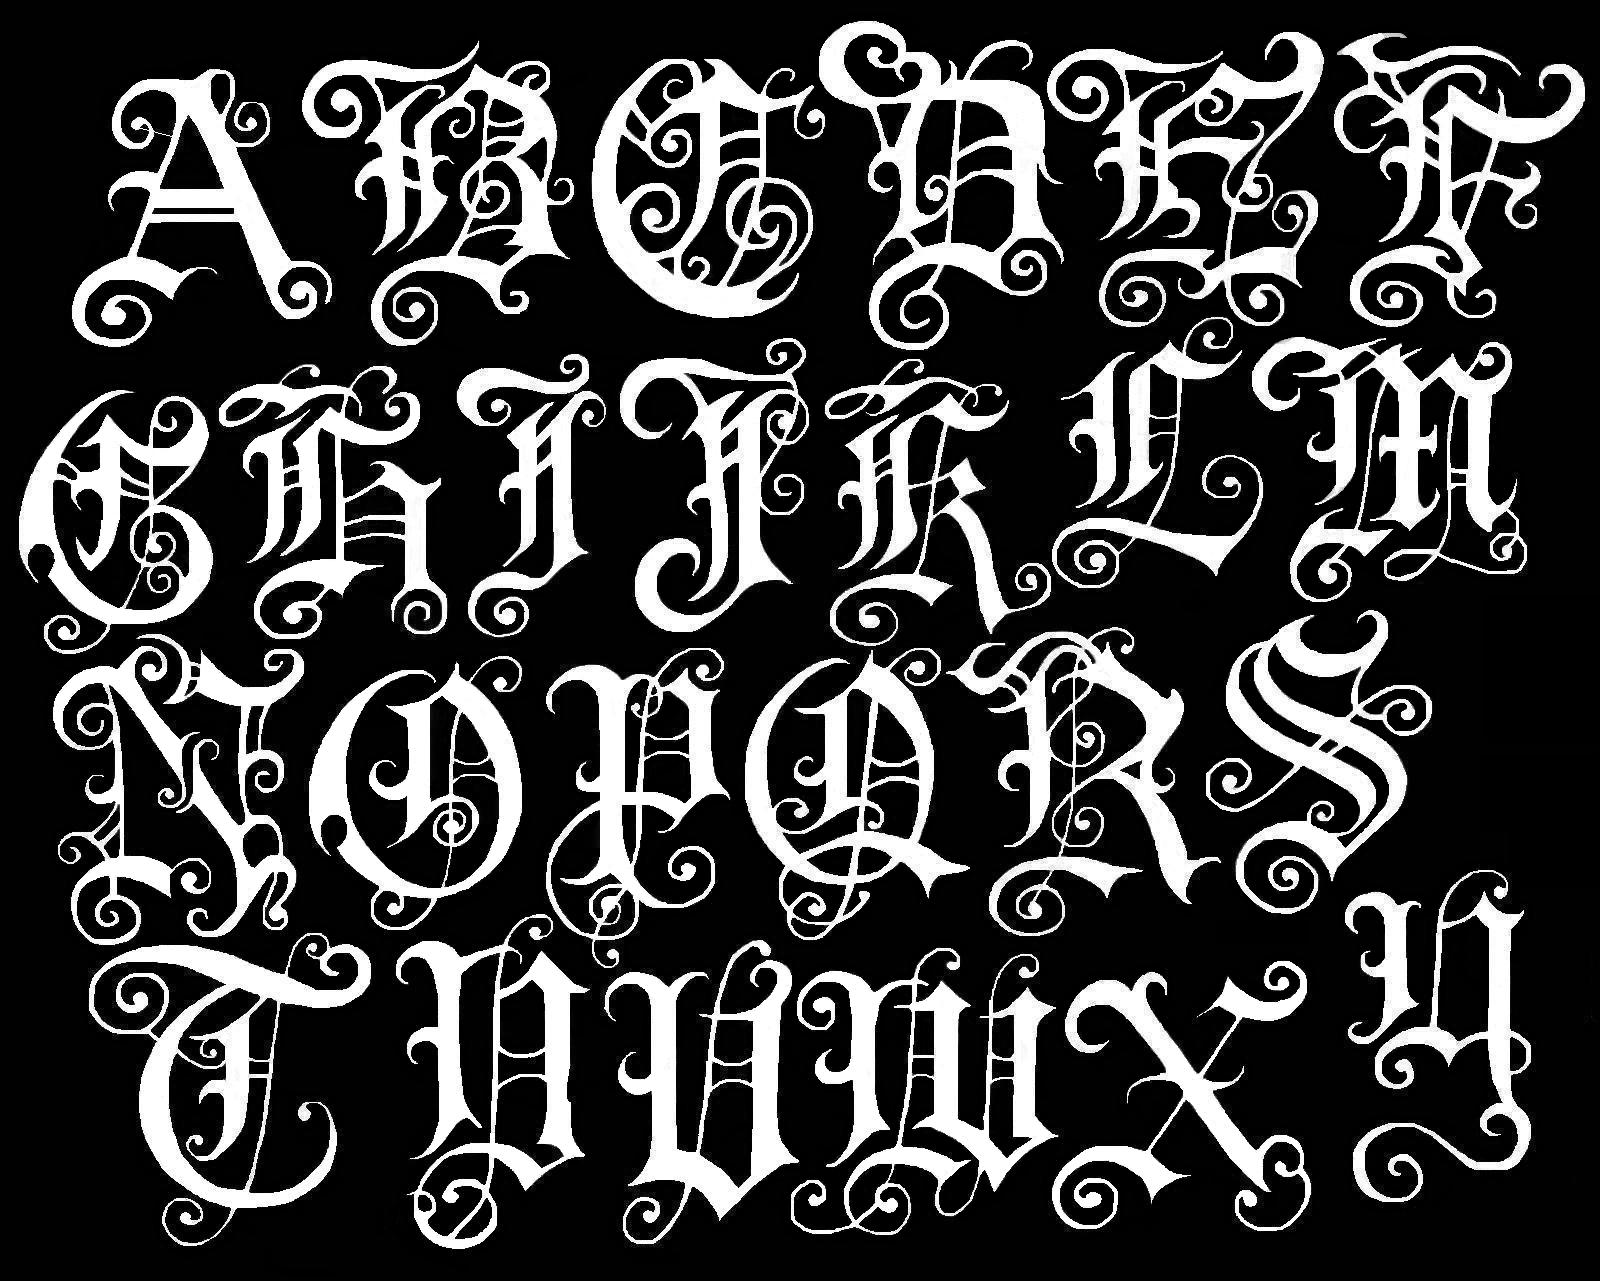 Graffiti Fonts Alphabet Old English Letter